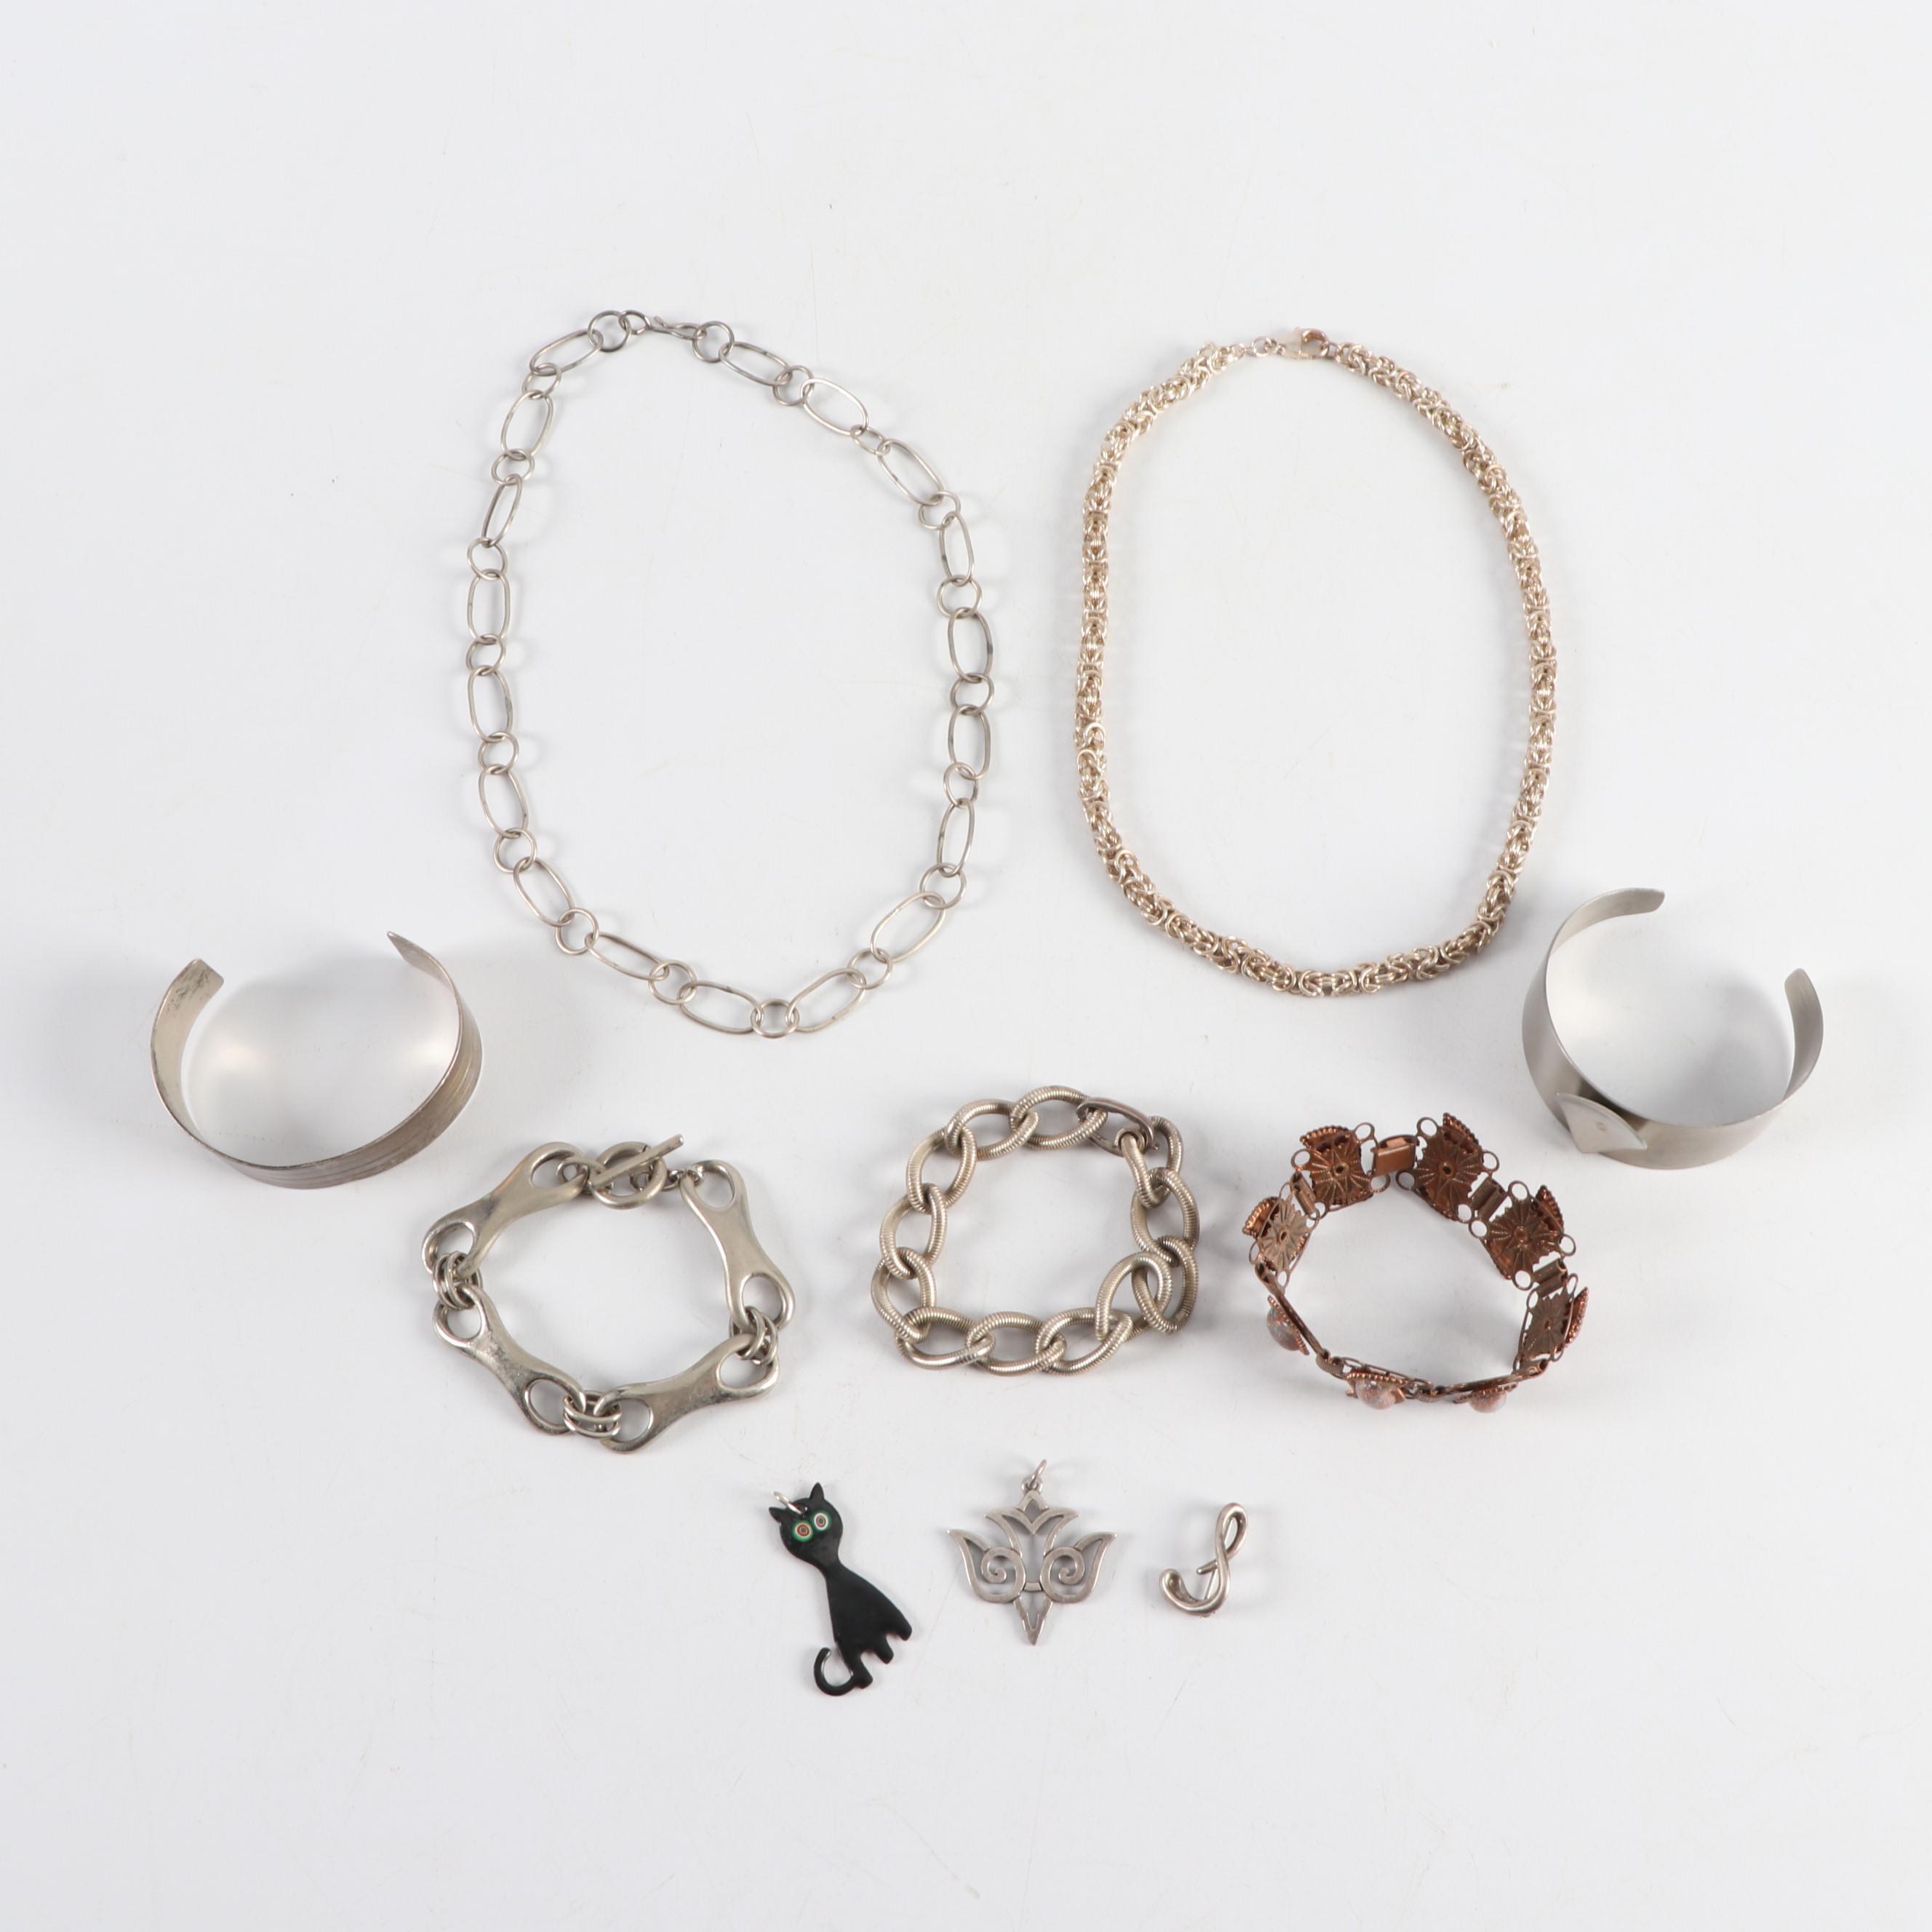 Avery Sterling Pendant, Grosse Sterling Bracelet, and More